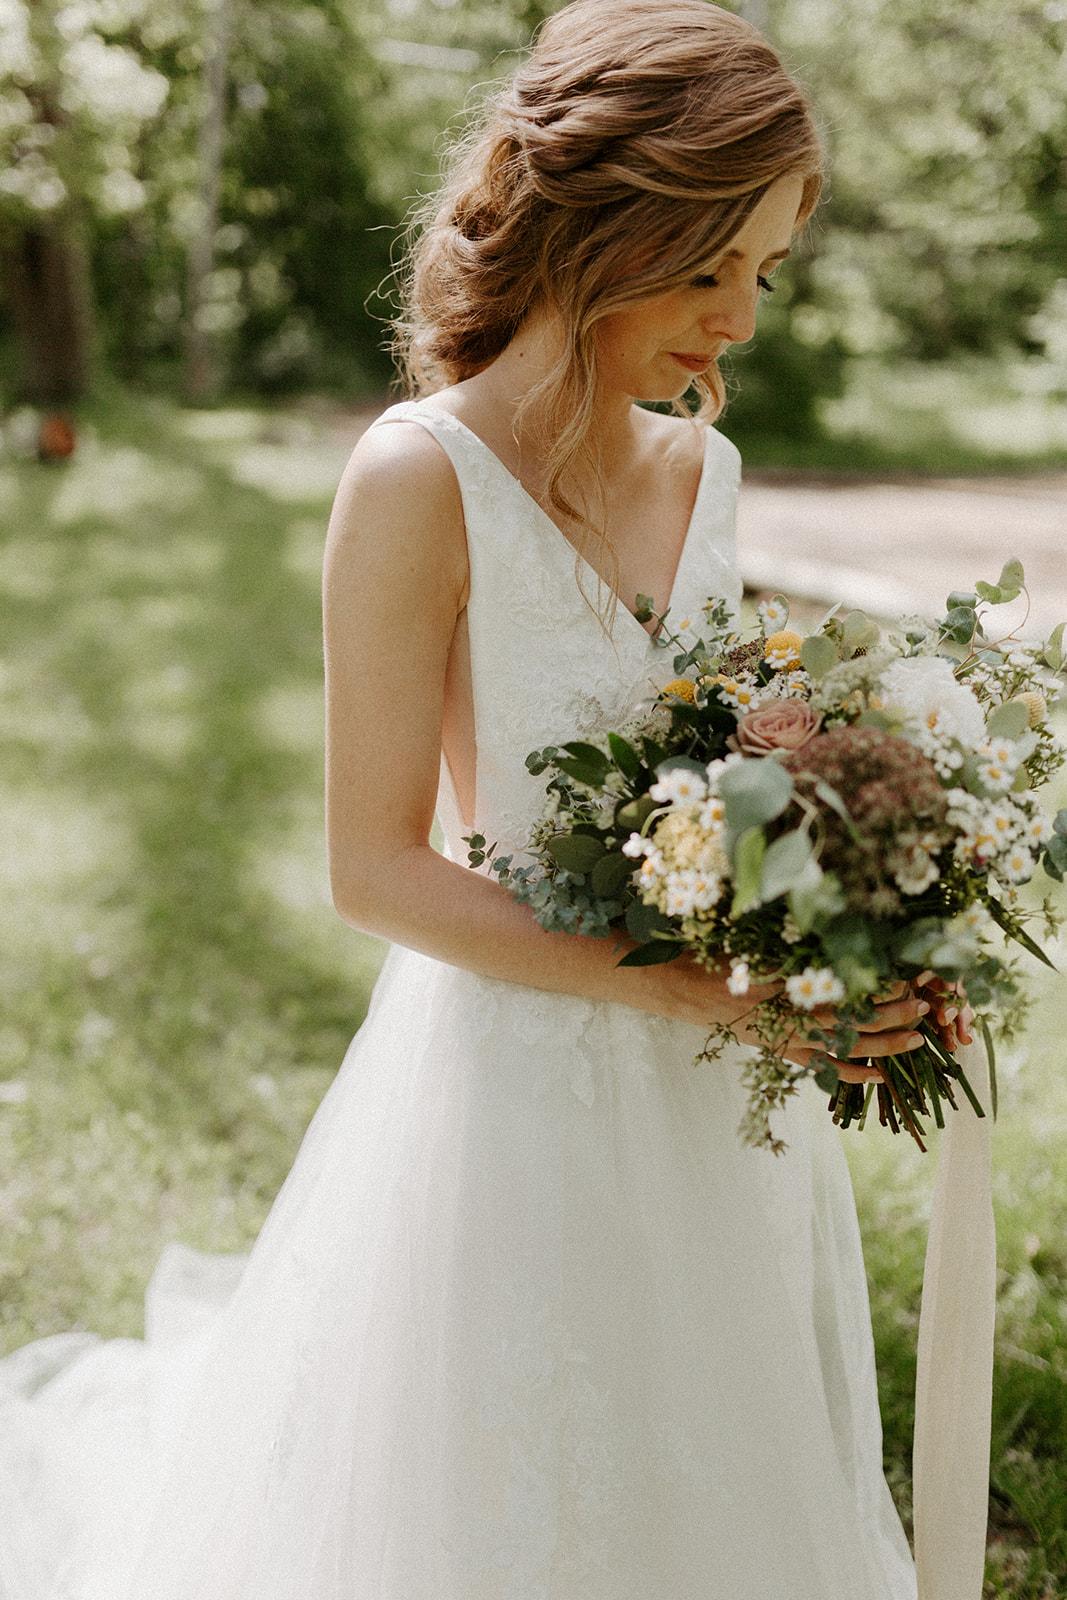 camp_wokanda_peoria_illinois_wedding_photographer_wright_photographs_bliese_0645.jpg